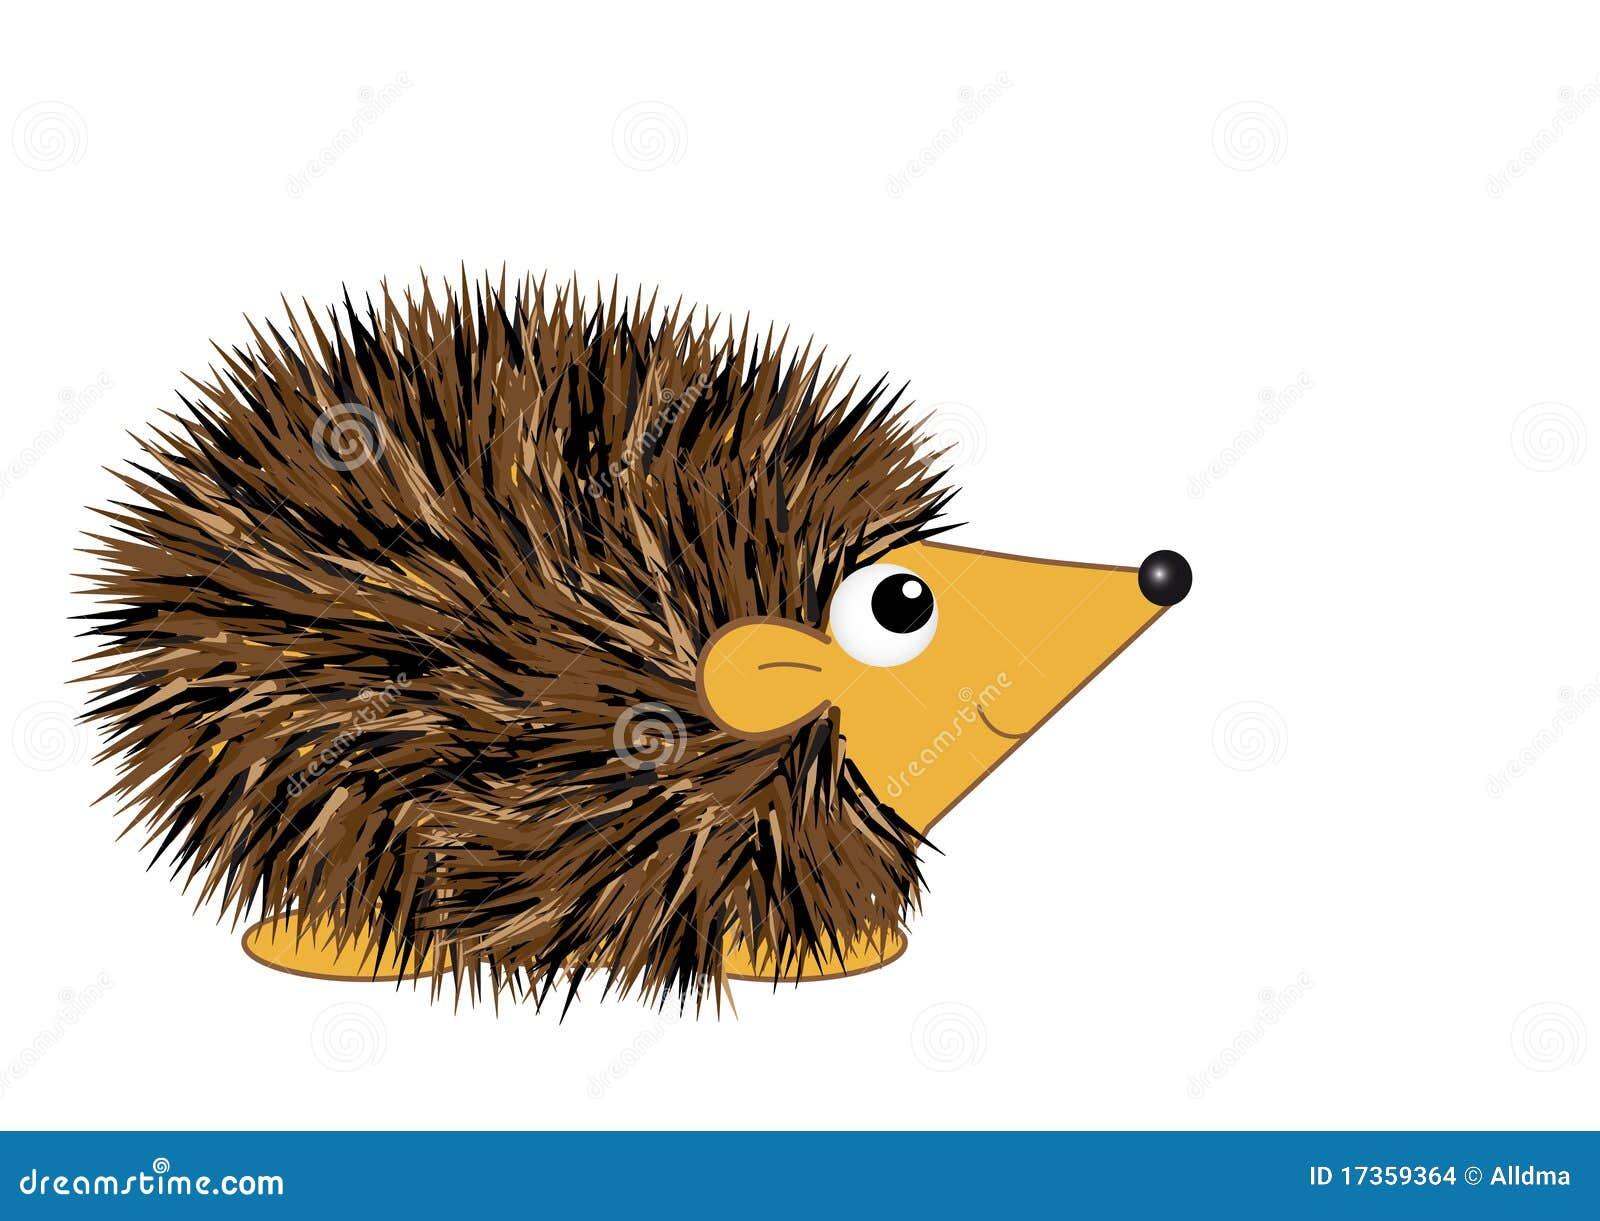 Cartoon Hedgehog Stock Images - Image: 17359364